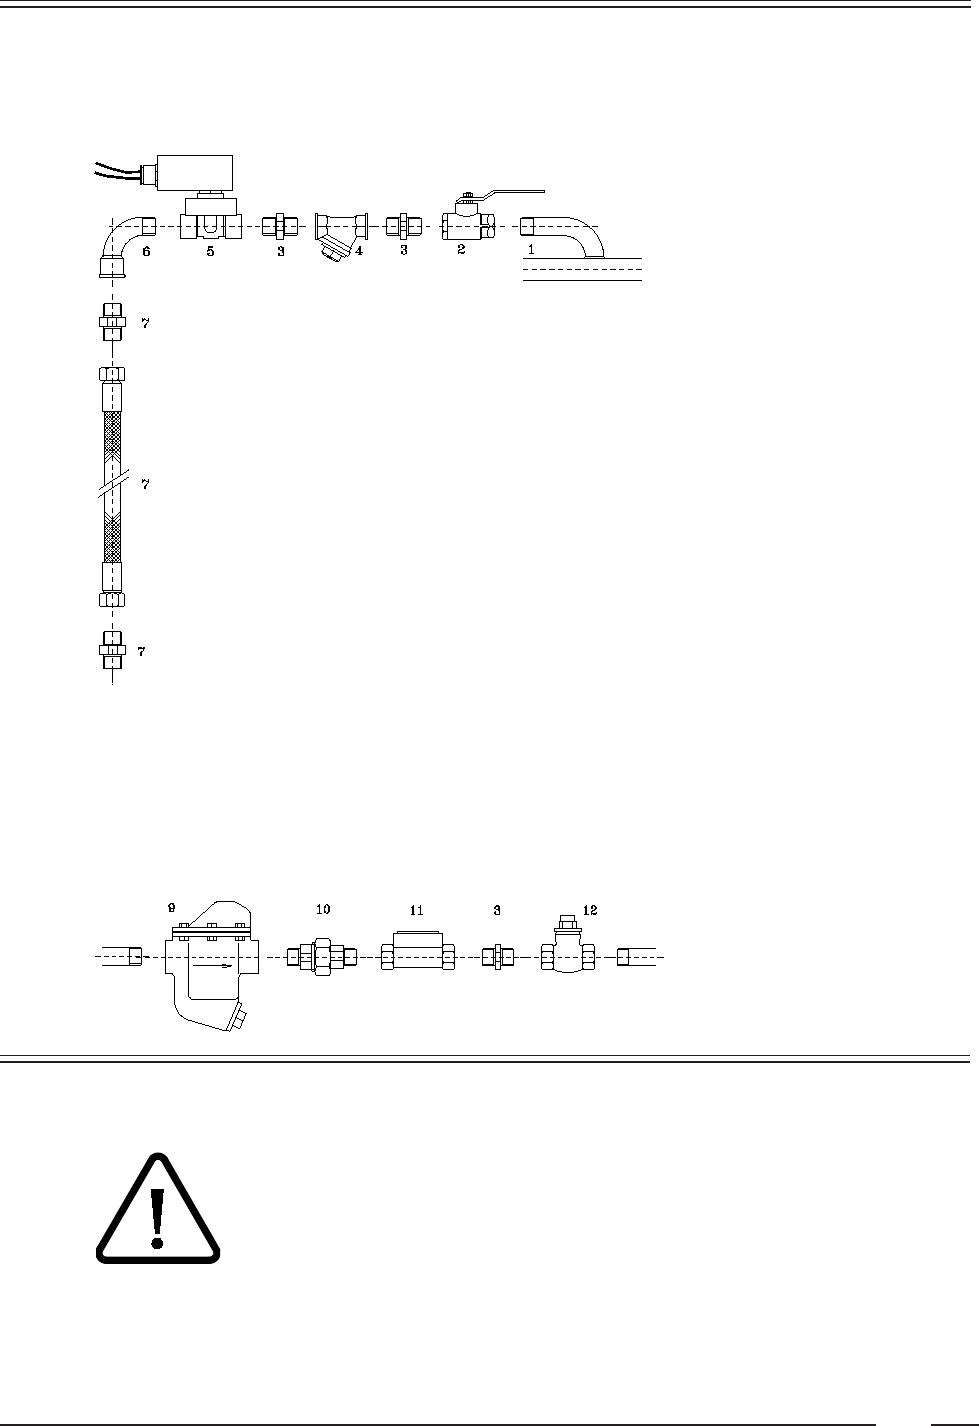 Handleiding Ipso Hf 185 Pagina 11 Van 32 English Washing Machine Wiring Diagram